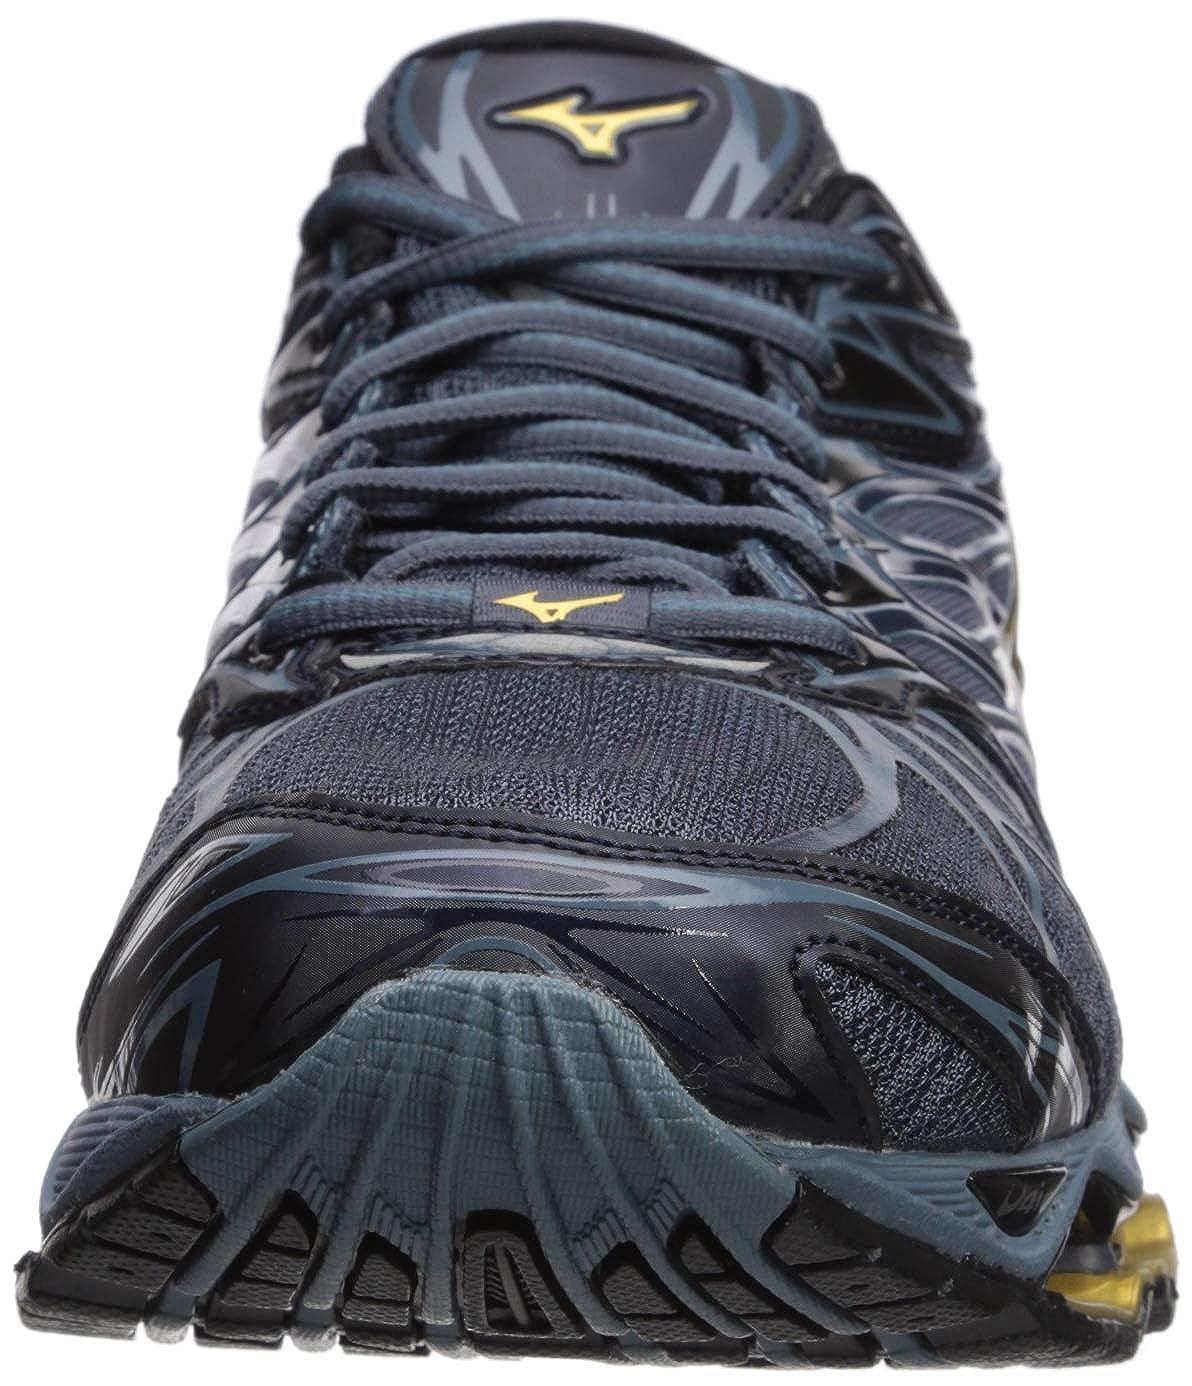 Mizuno Wave Prophecy 7 Men s Running Shoes